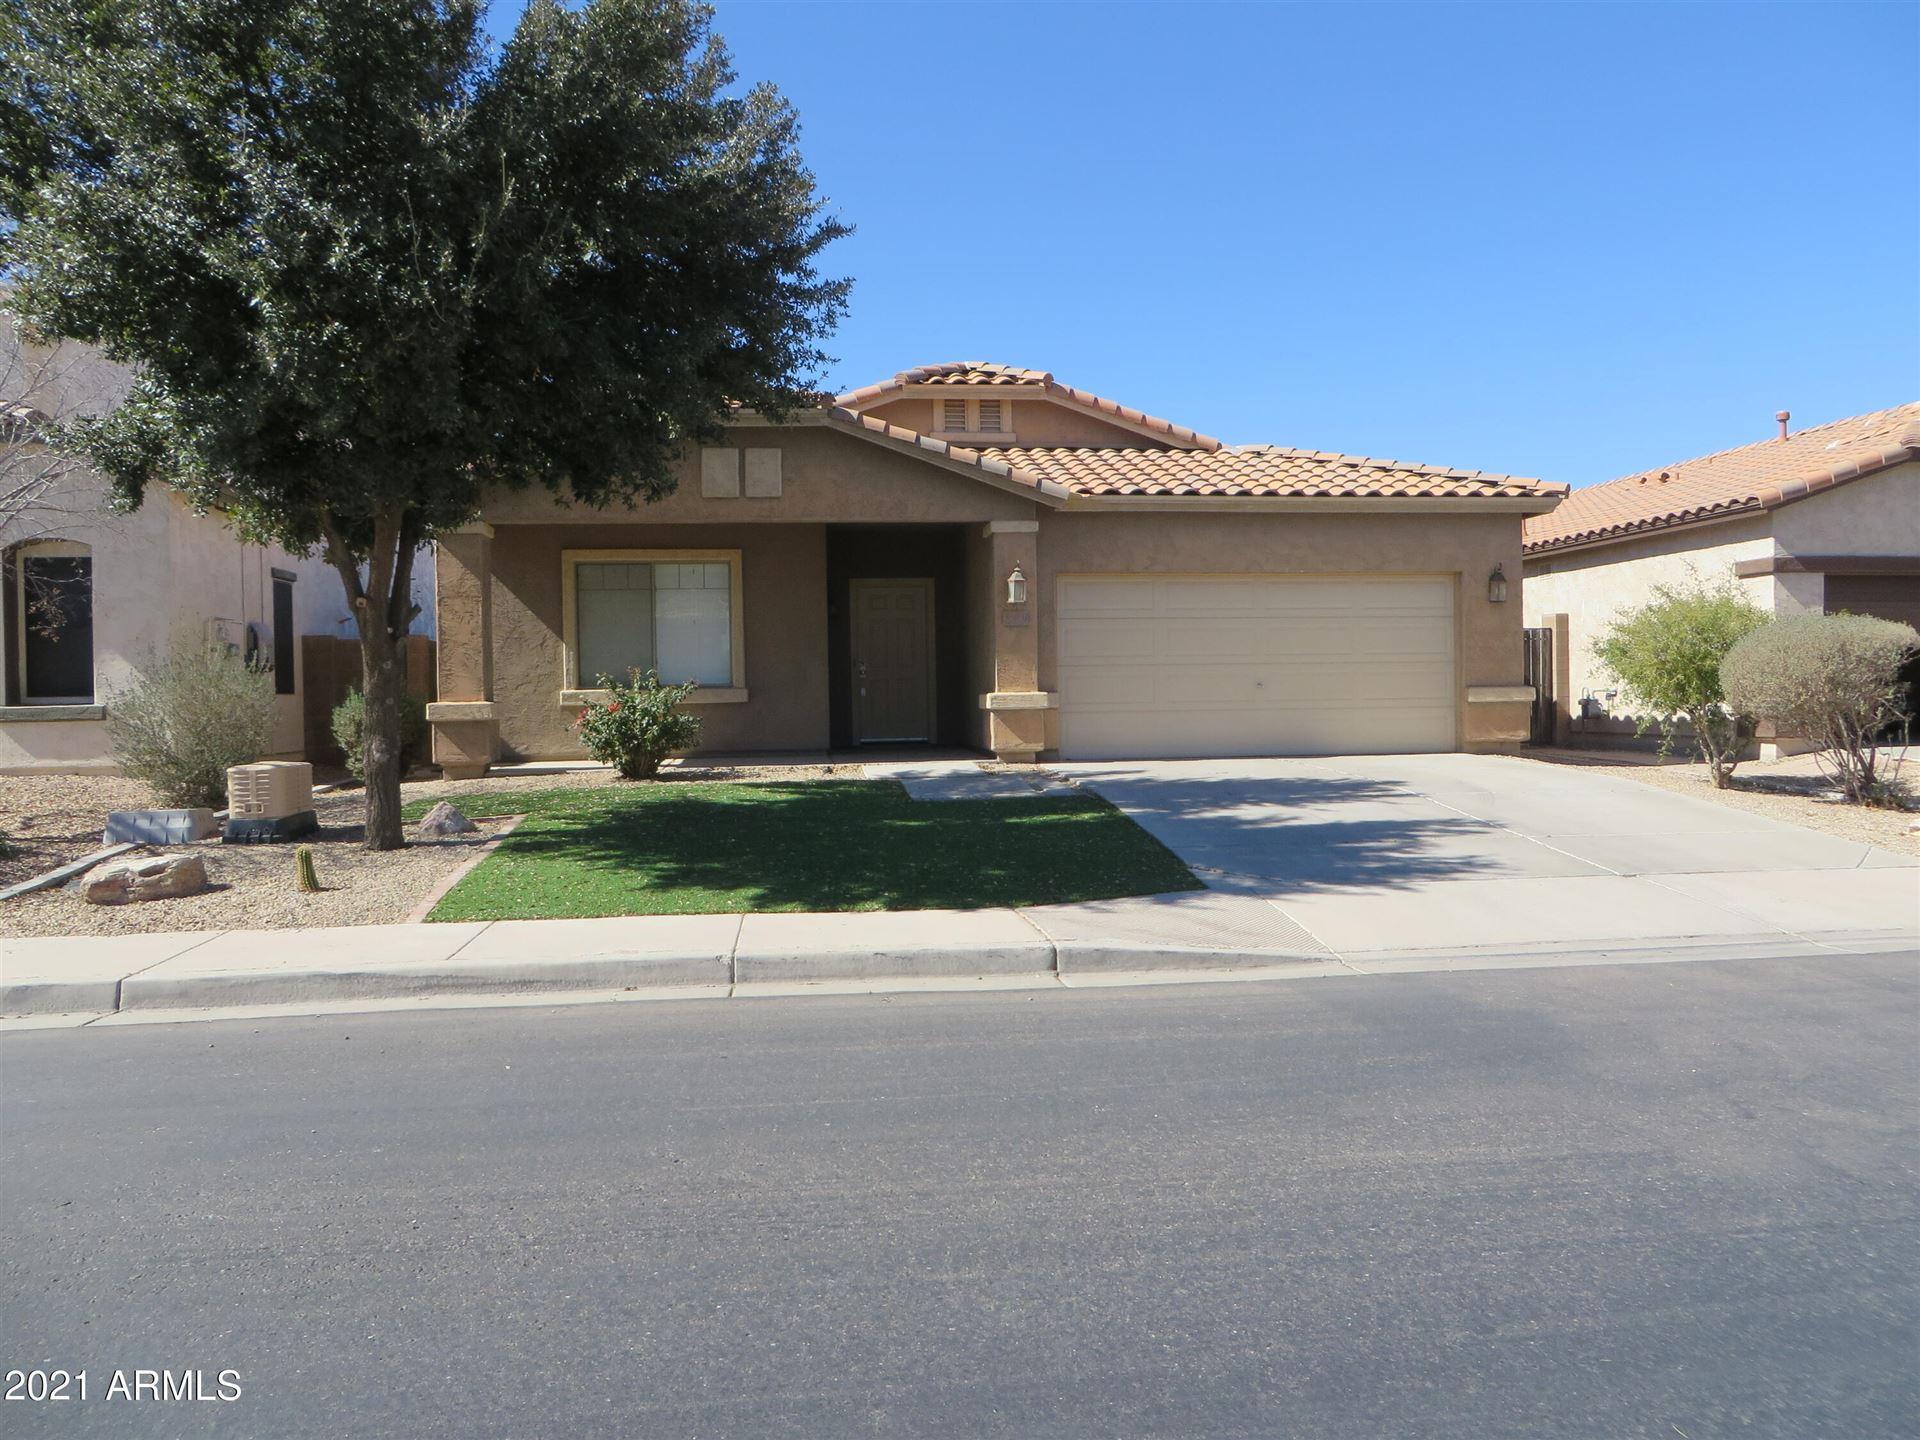 Photo for 20838 N Carmen Avenue, Maricopa, AZ 85139 (MLS # 6196369)